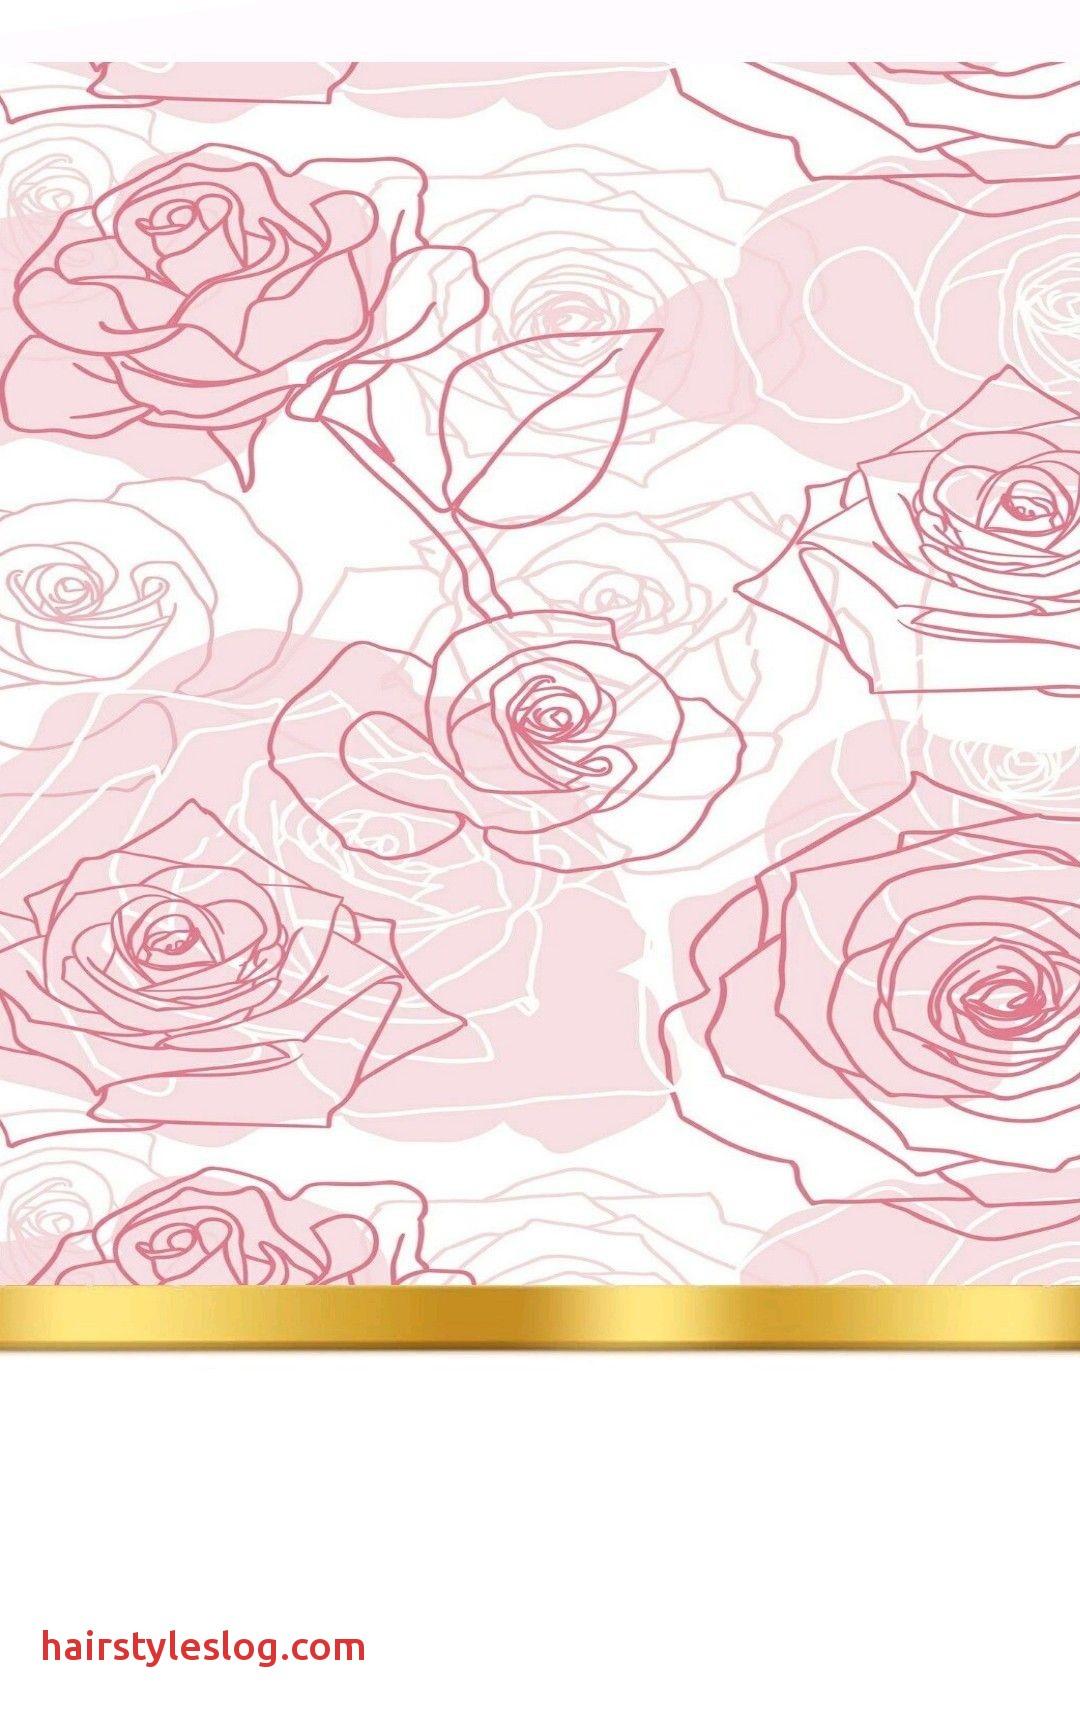 Charming Rose Gold Flower Wallpaper Regarding Home - Garden Roses , HD Wallpaper & Backgrounds